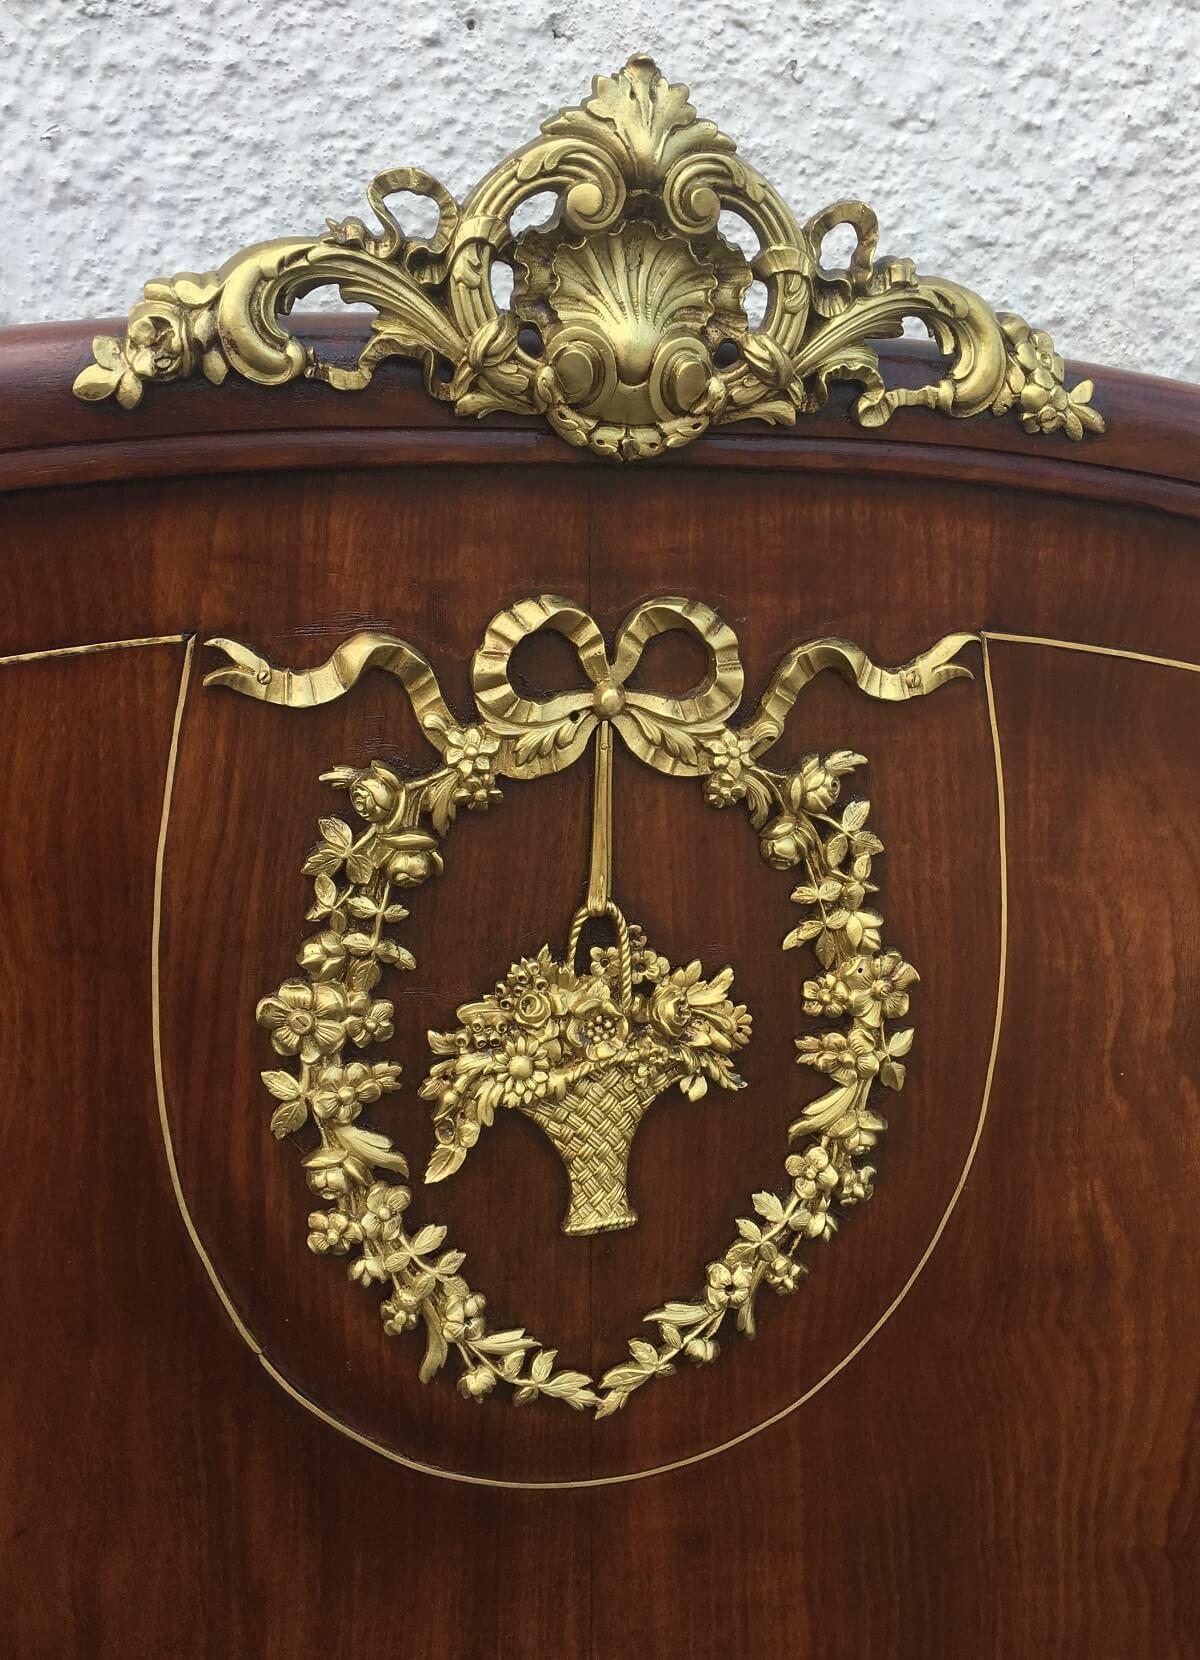 Espetacular Cama Antiga Luis Xv Lindos Apliques Bronze